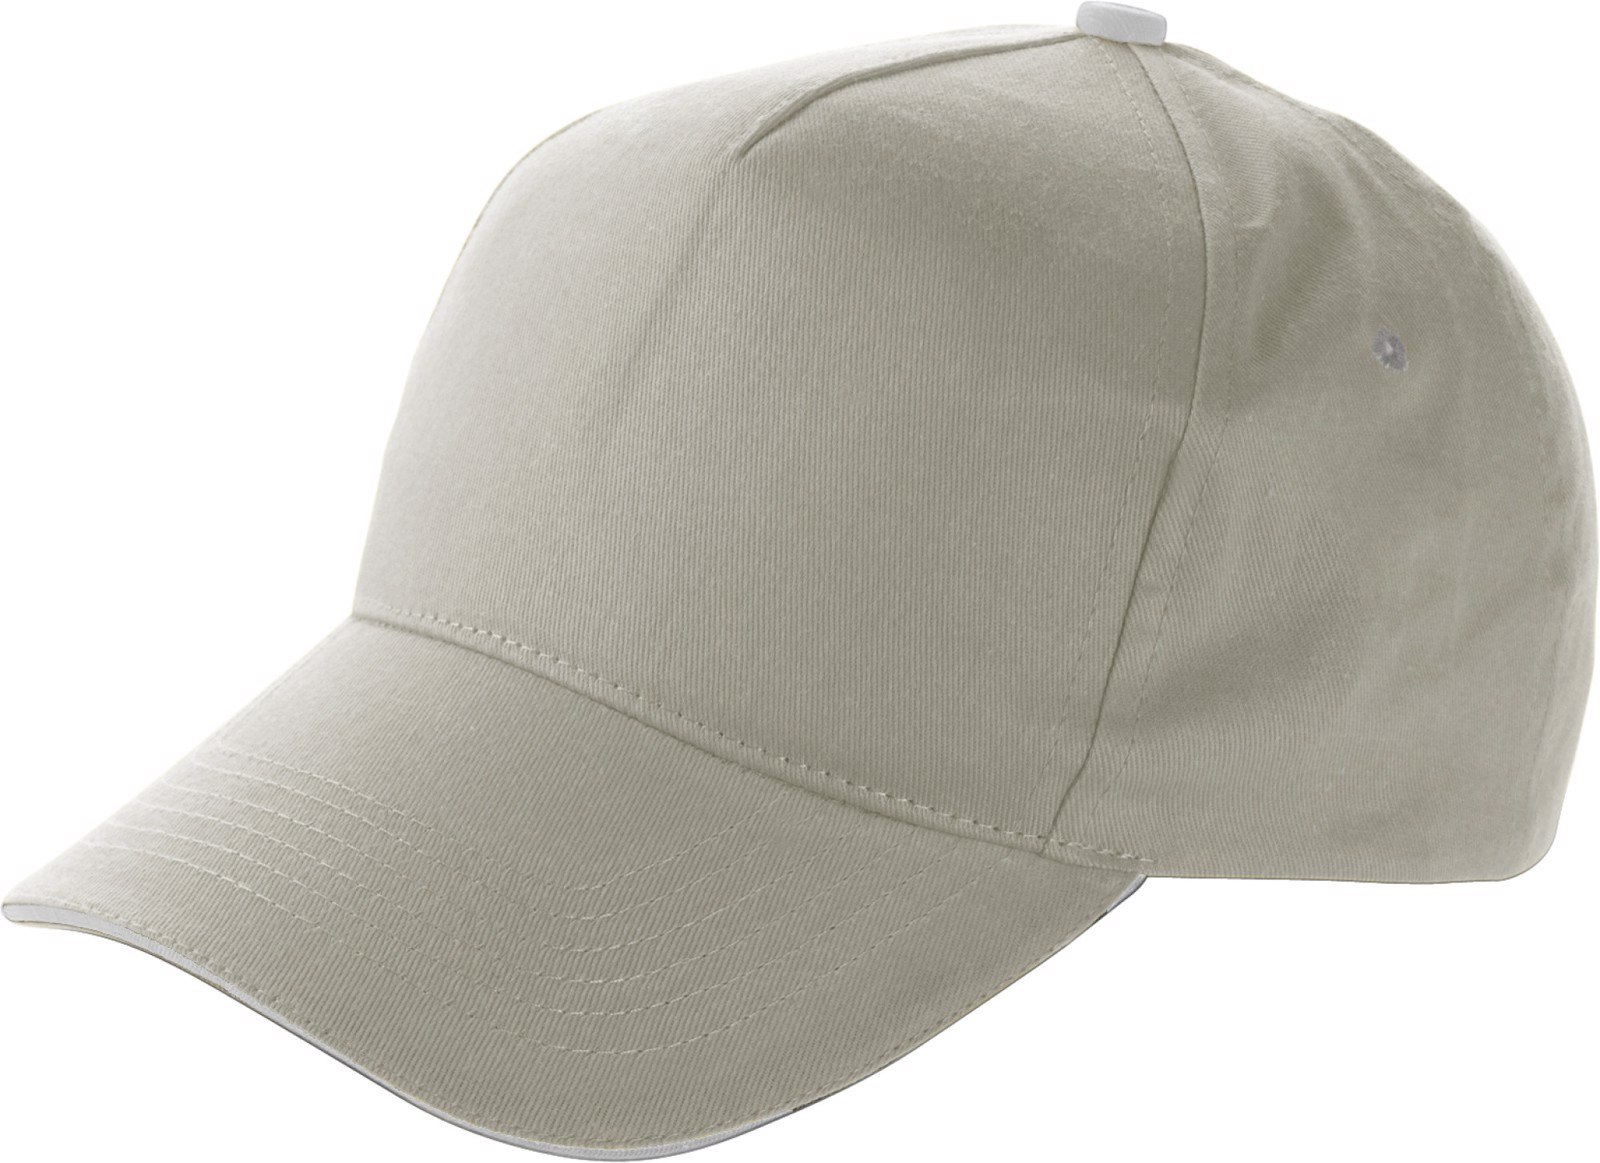 Cotton cap - Grey